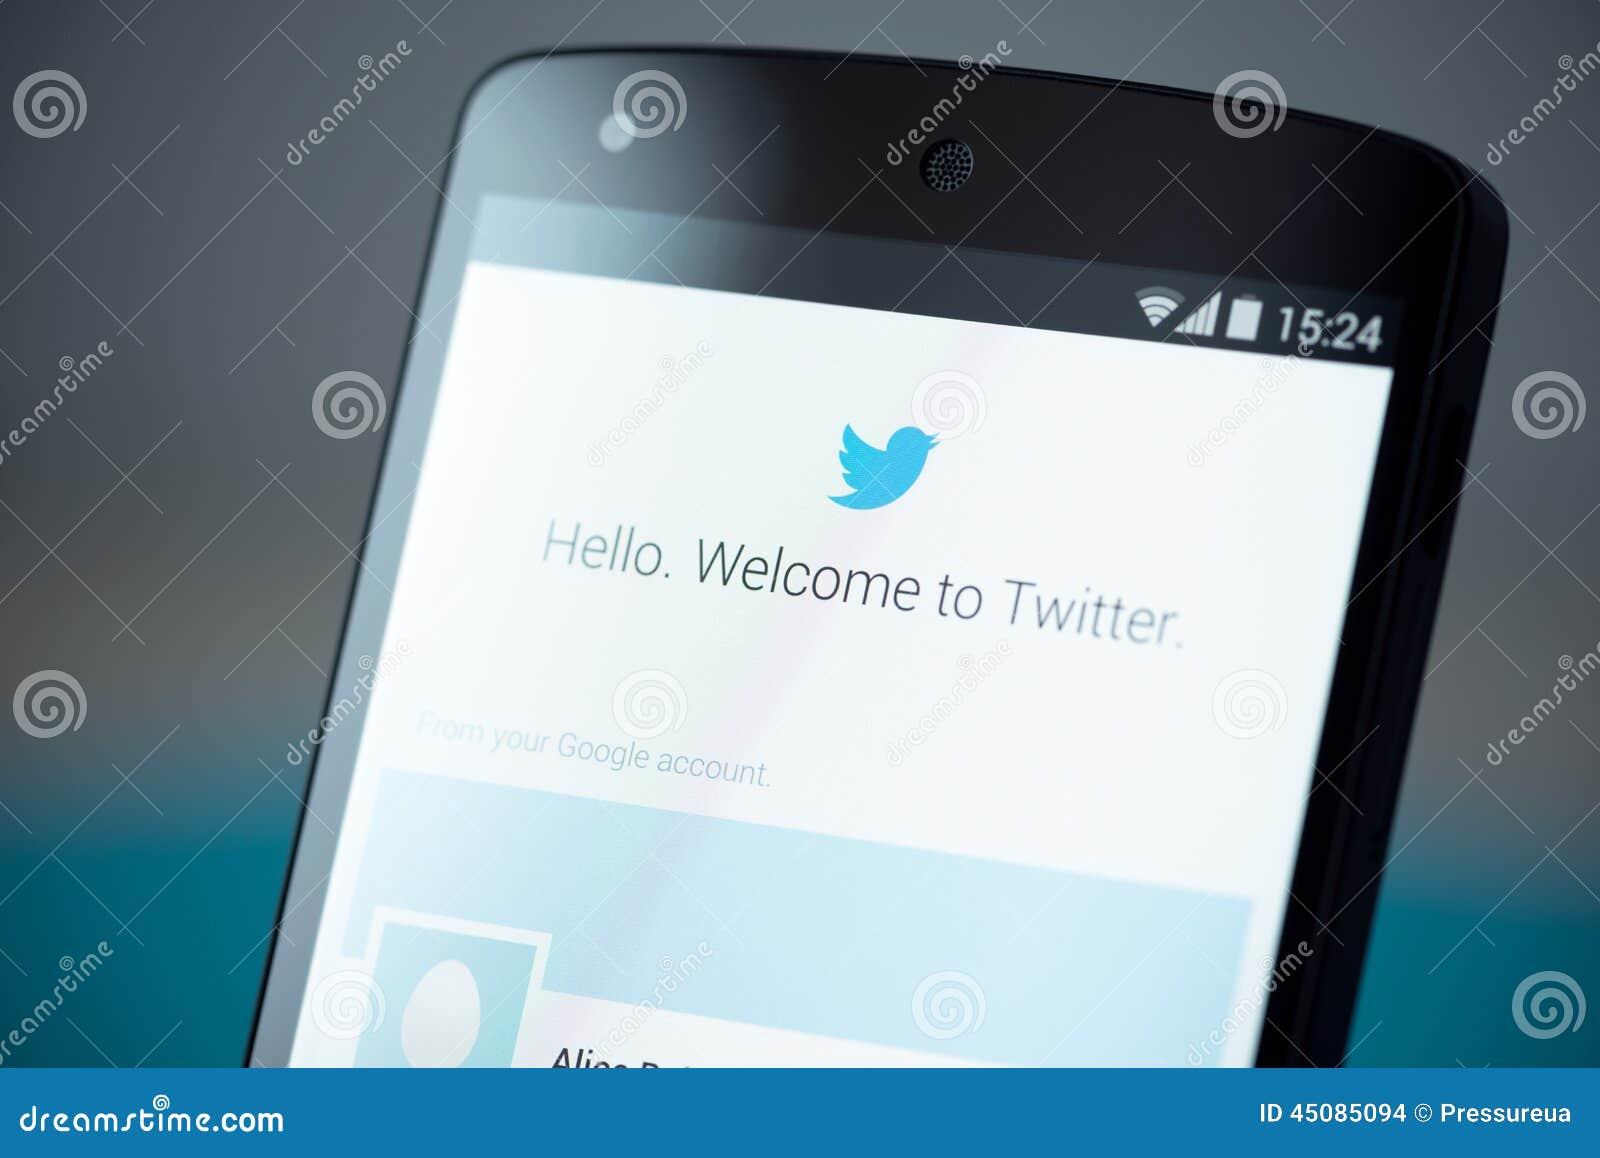 Twitter Login Page On Google Nexus 5 Editorial Stock Image - Image